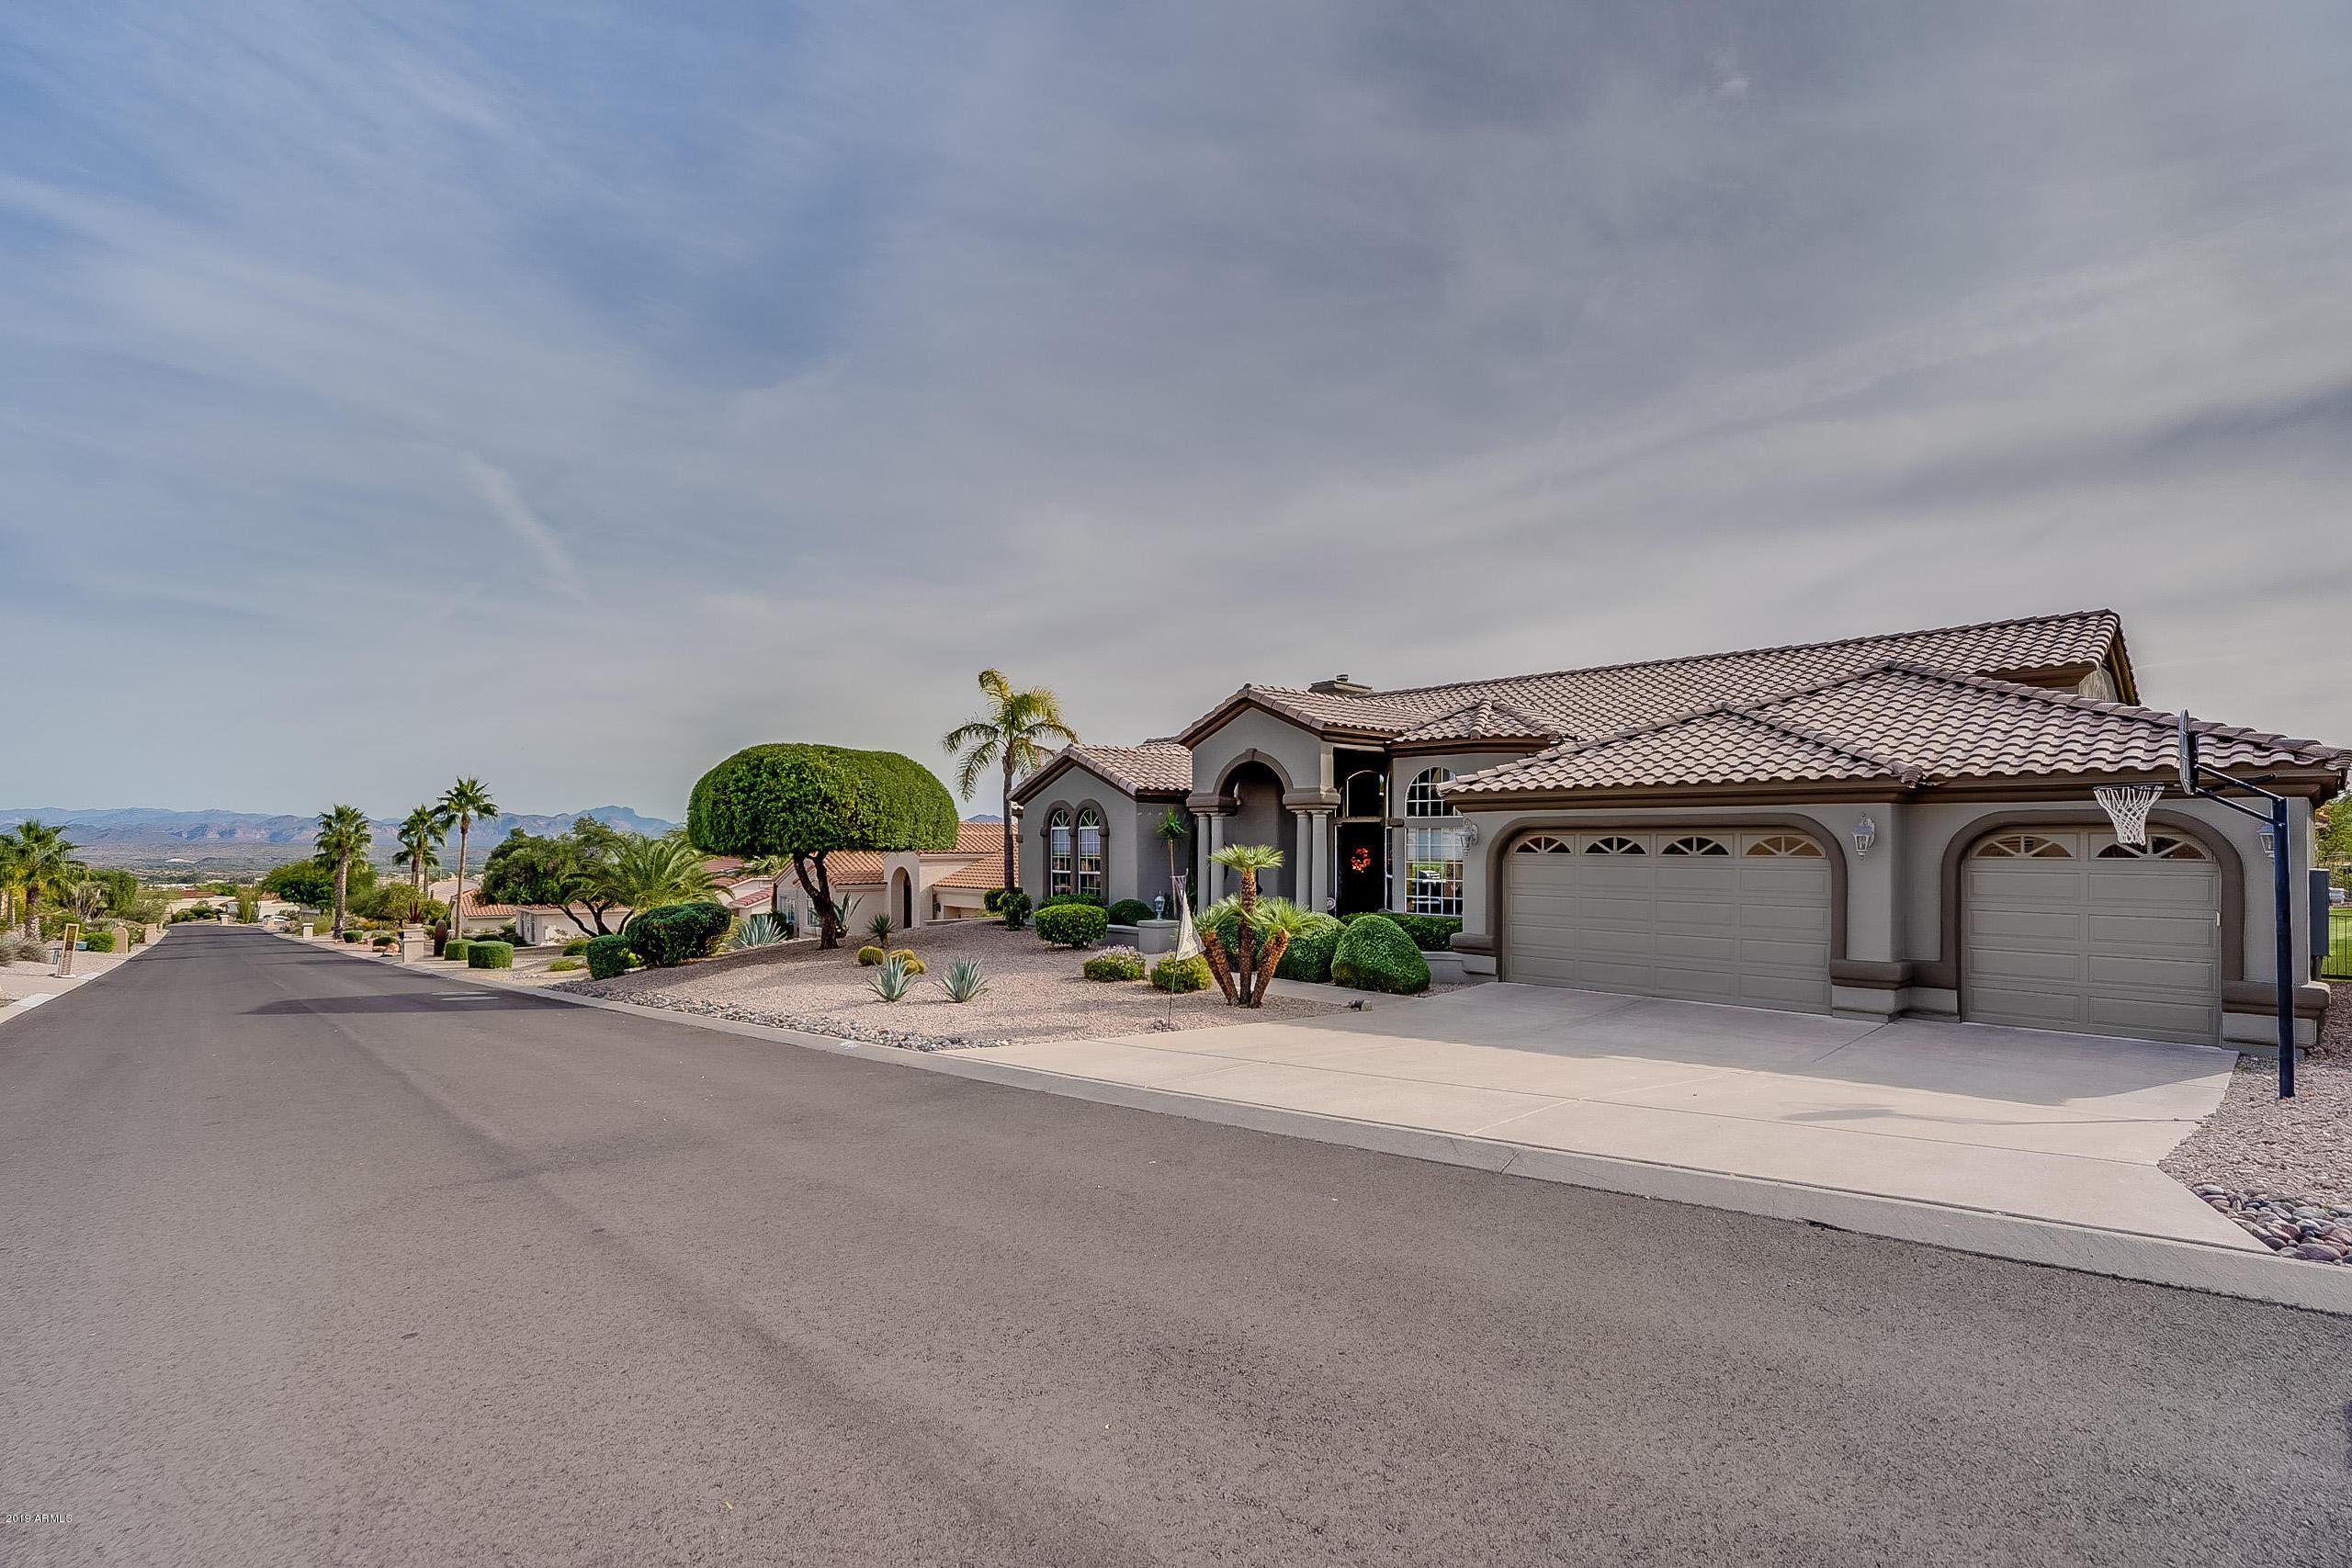 Photo of 15855 E BRODIEA Drive, Fountain Hills, AZ 85268